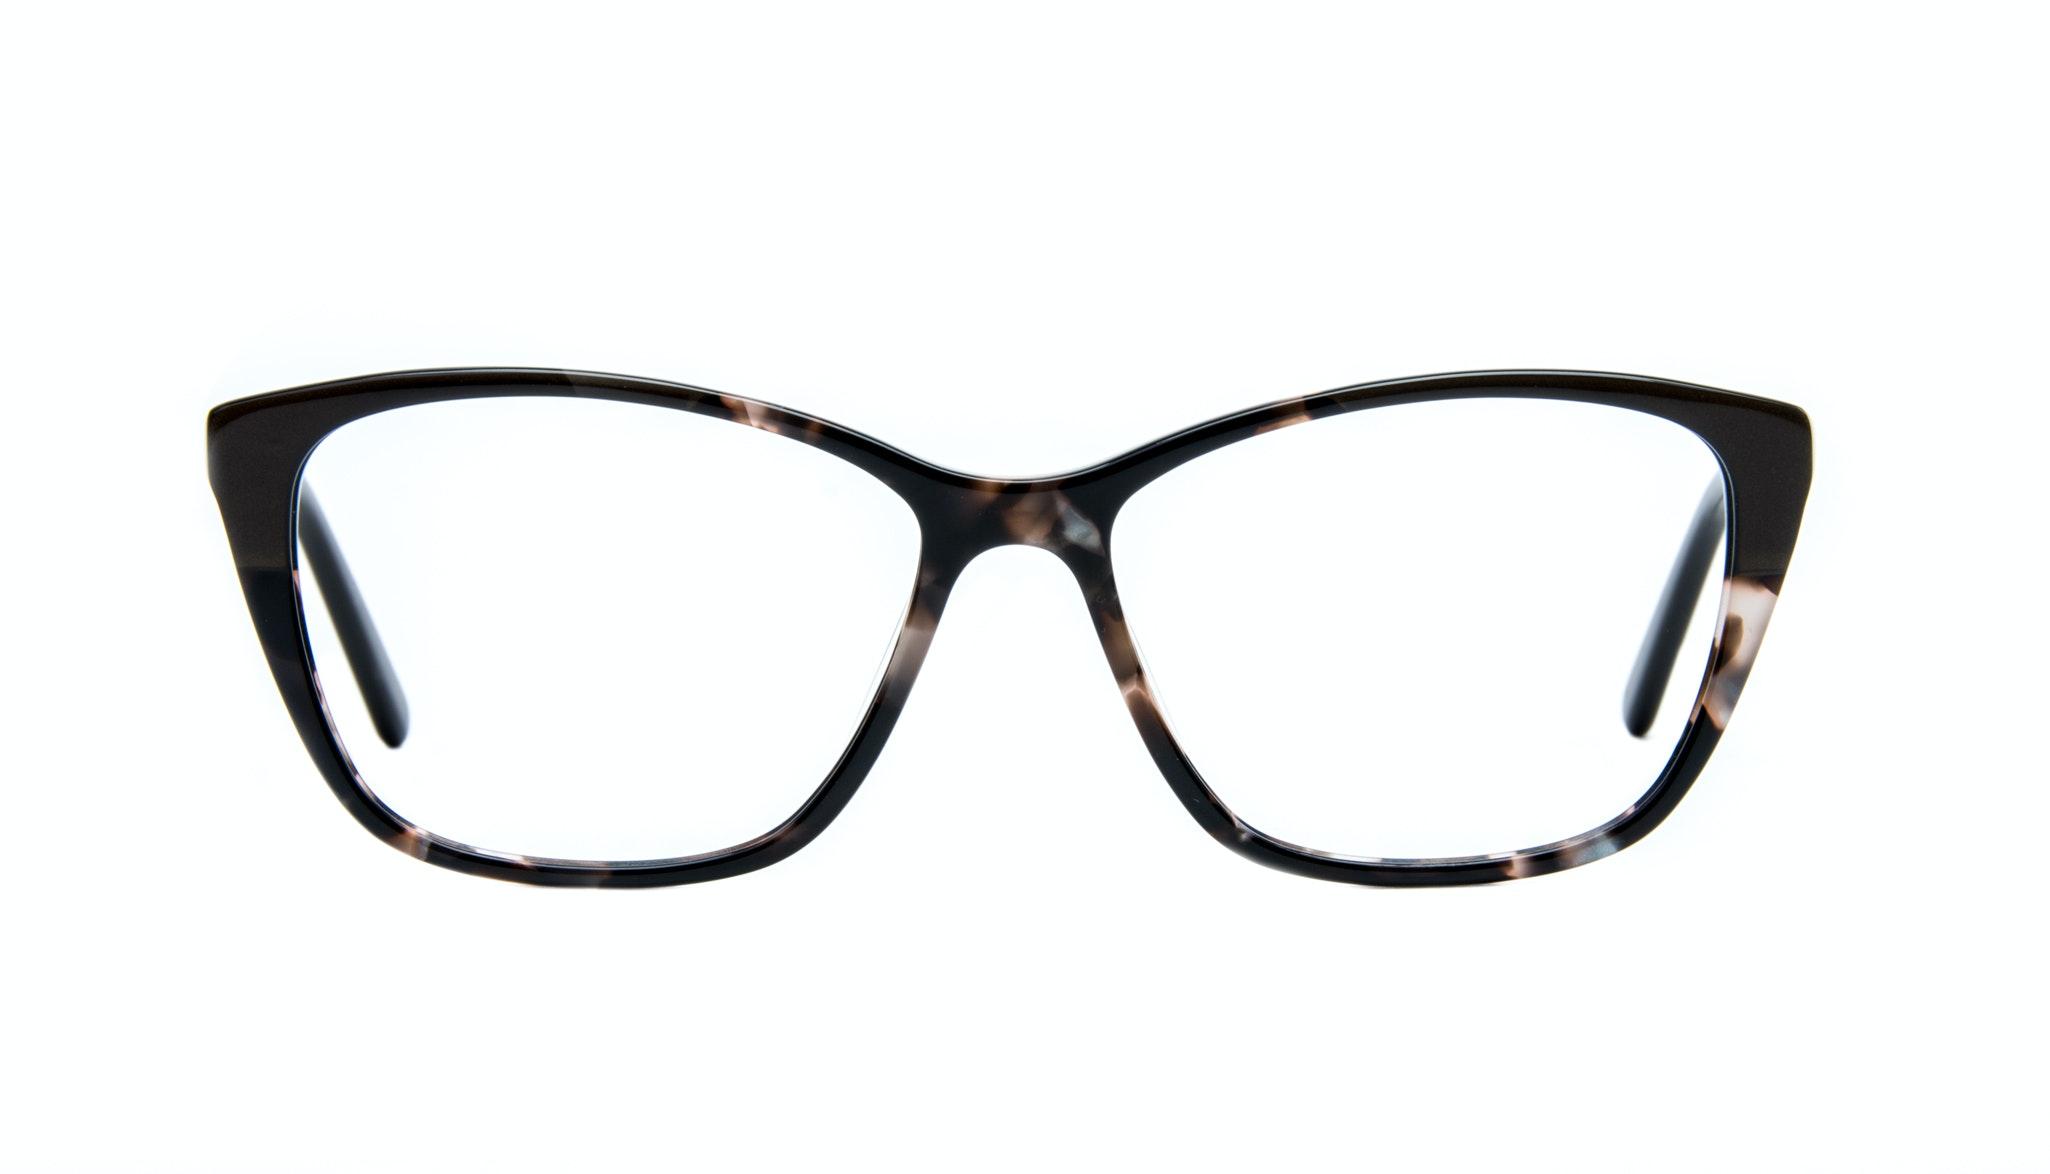 Affordable Fashion Glasses Cat Eye Rectangle Eyeglasses Women Myrtle Grey Stone Front